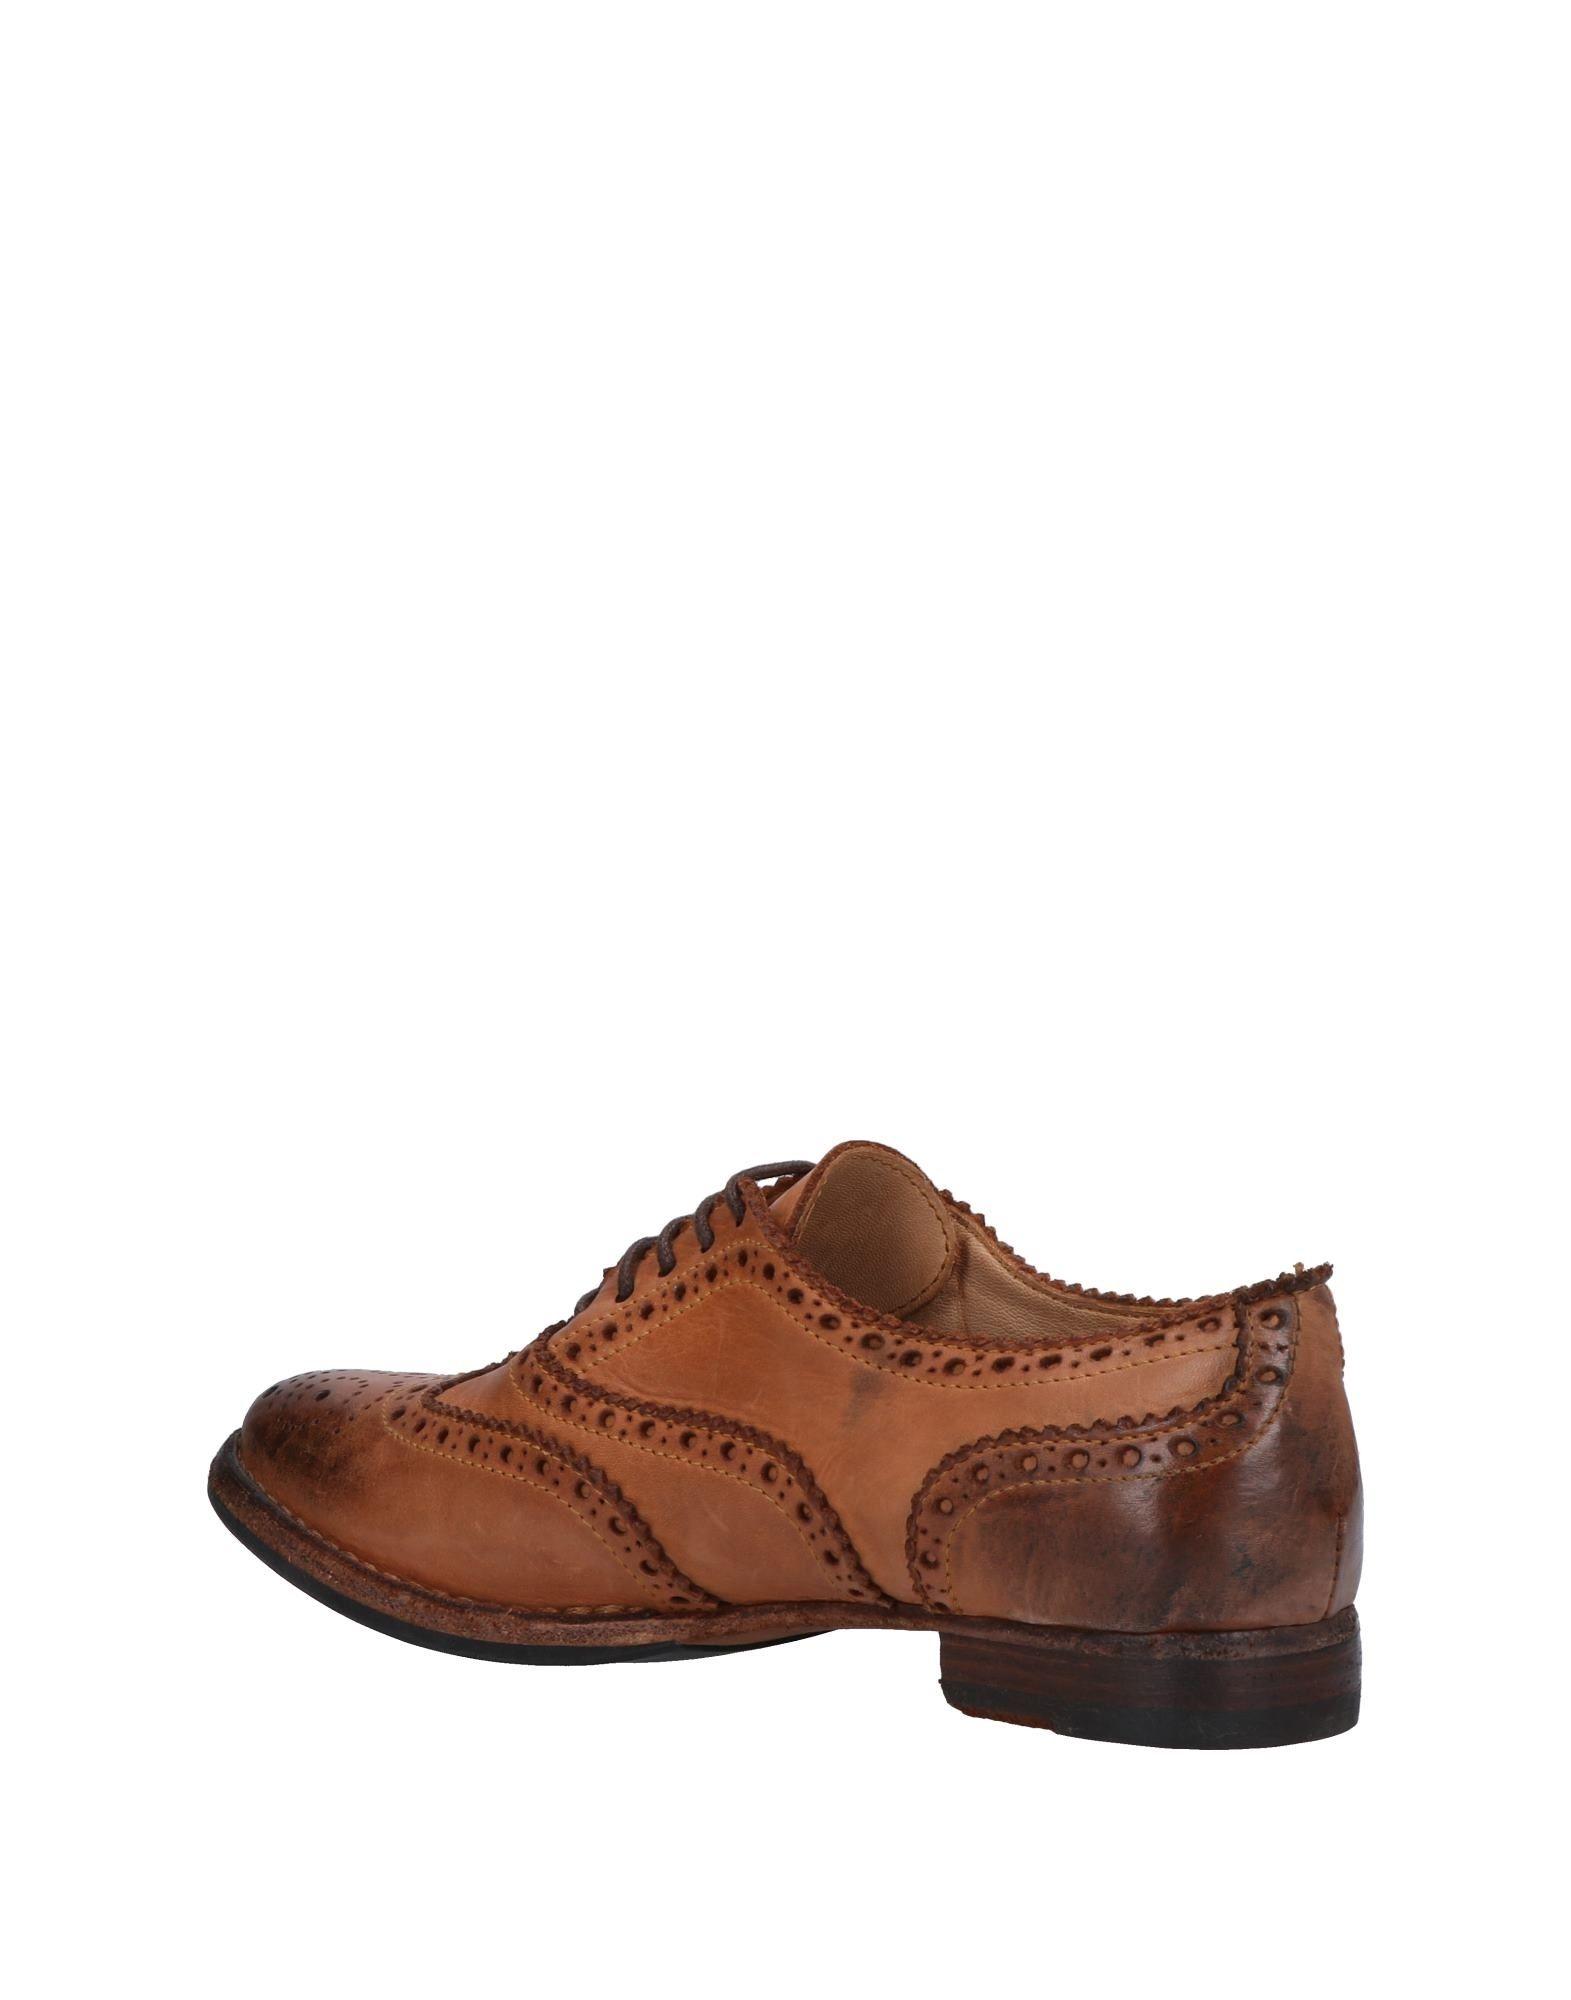 Stilvolle billige Schuhe Gidigio Schnürschuhe Damen Damen Damen  11502645GS d9d1f5